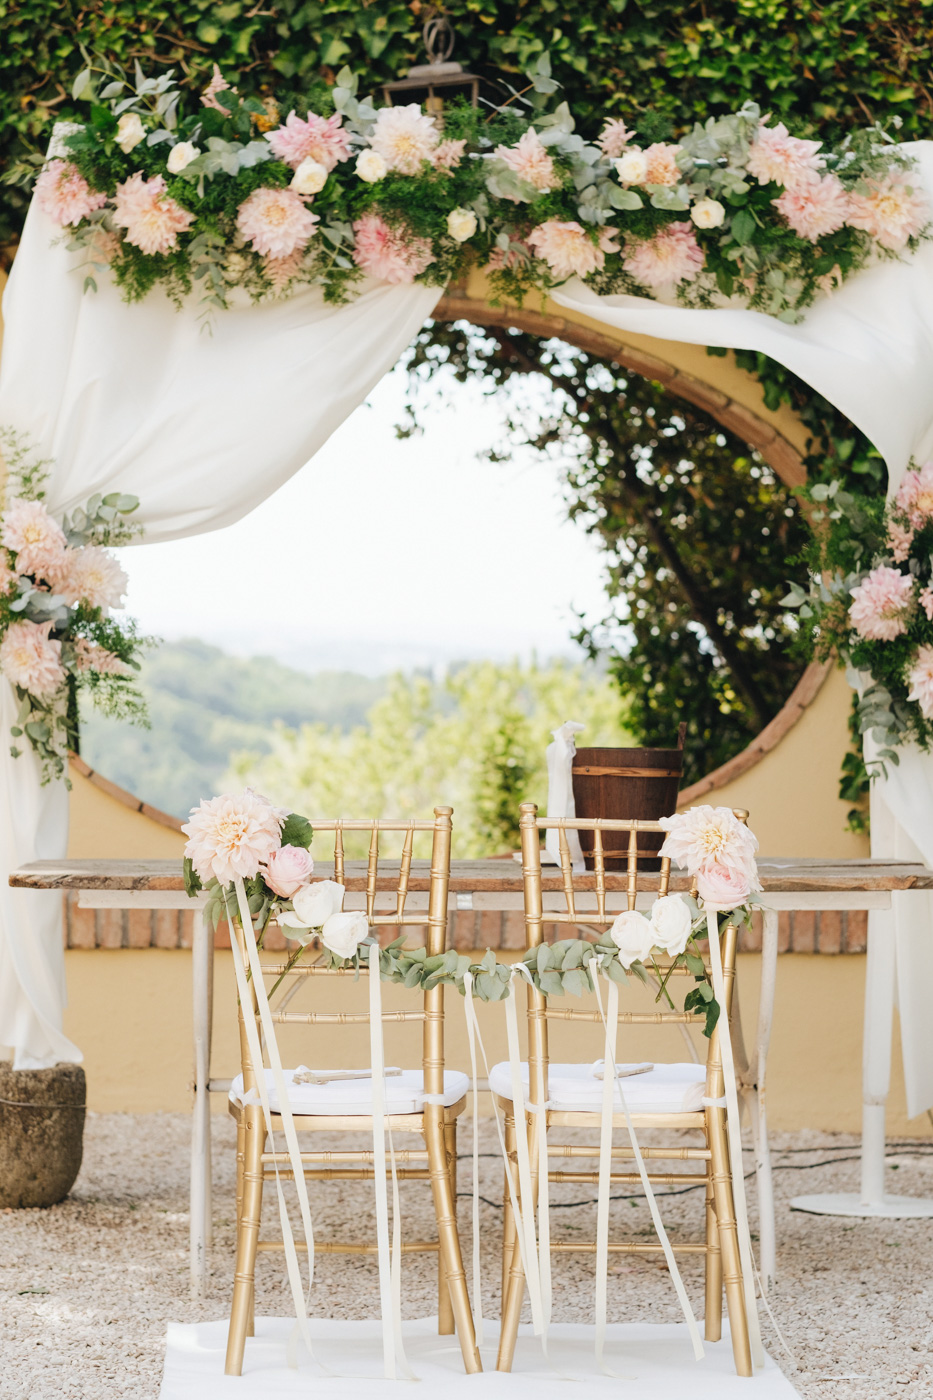 Matrimoni all'italiana wedding photographer italy-5.jpg